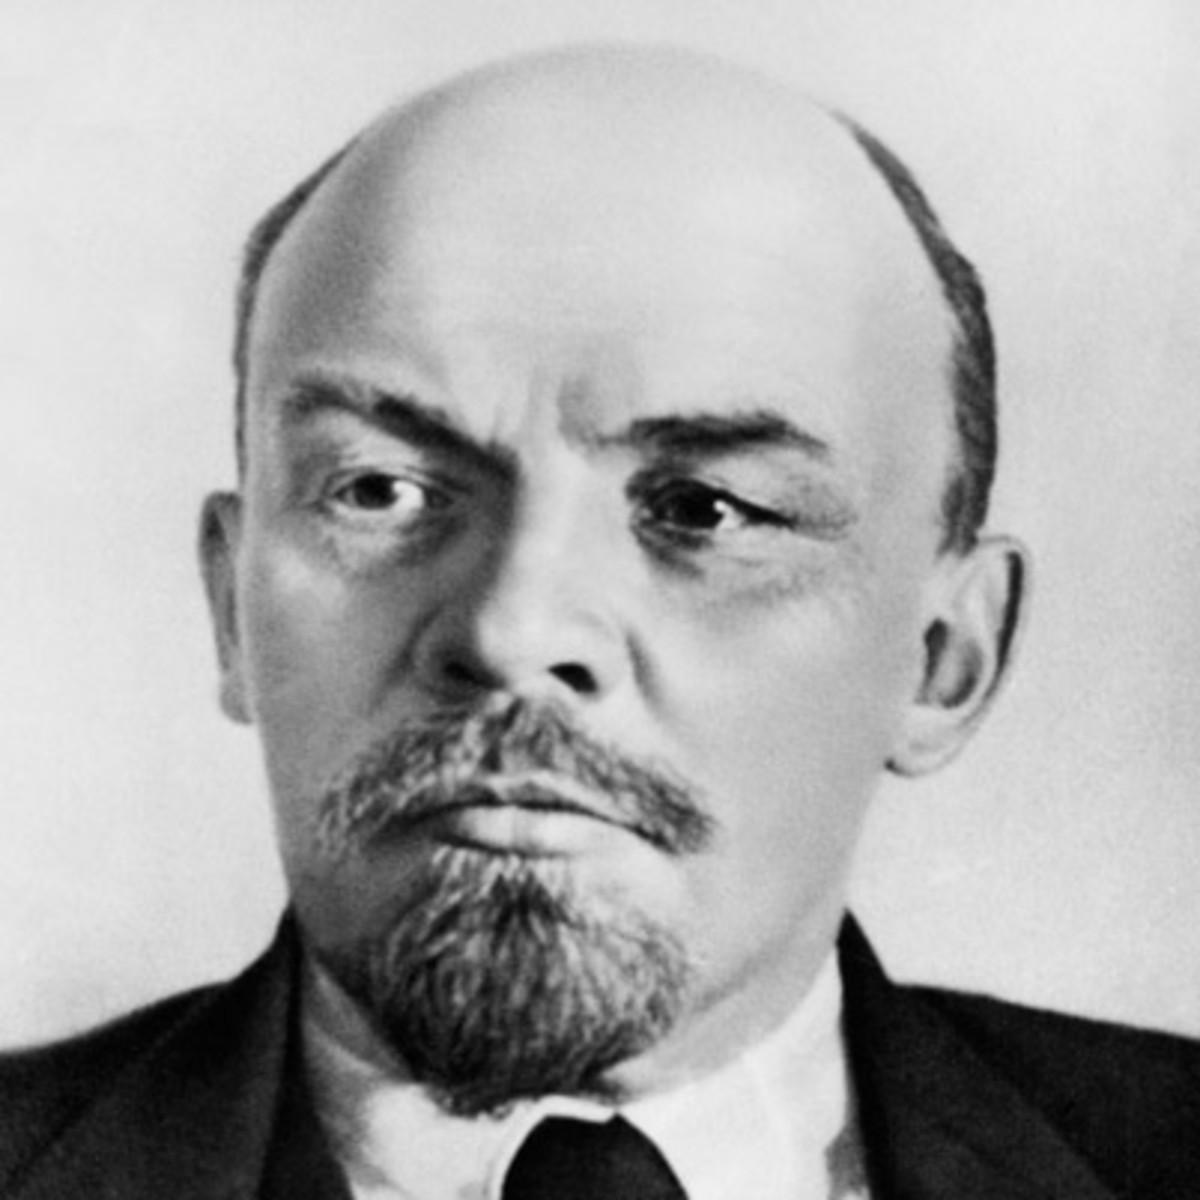 Vladimir-lenin-9379007-1-402